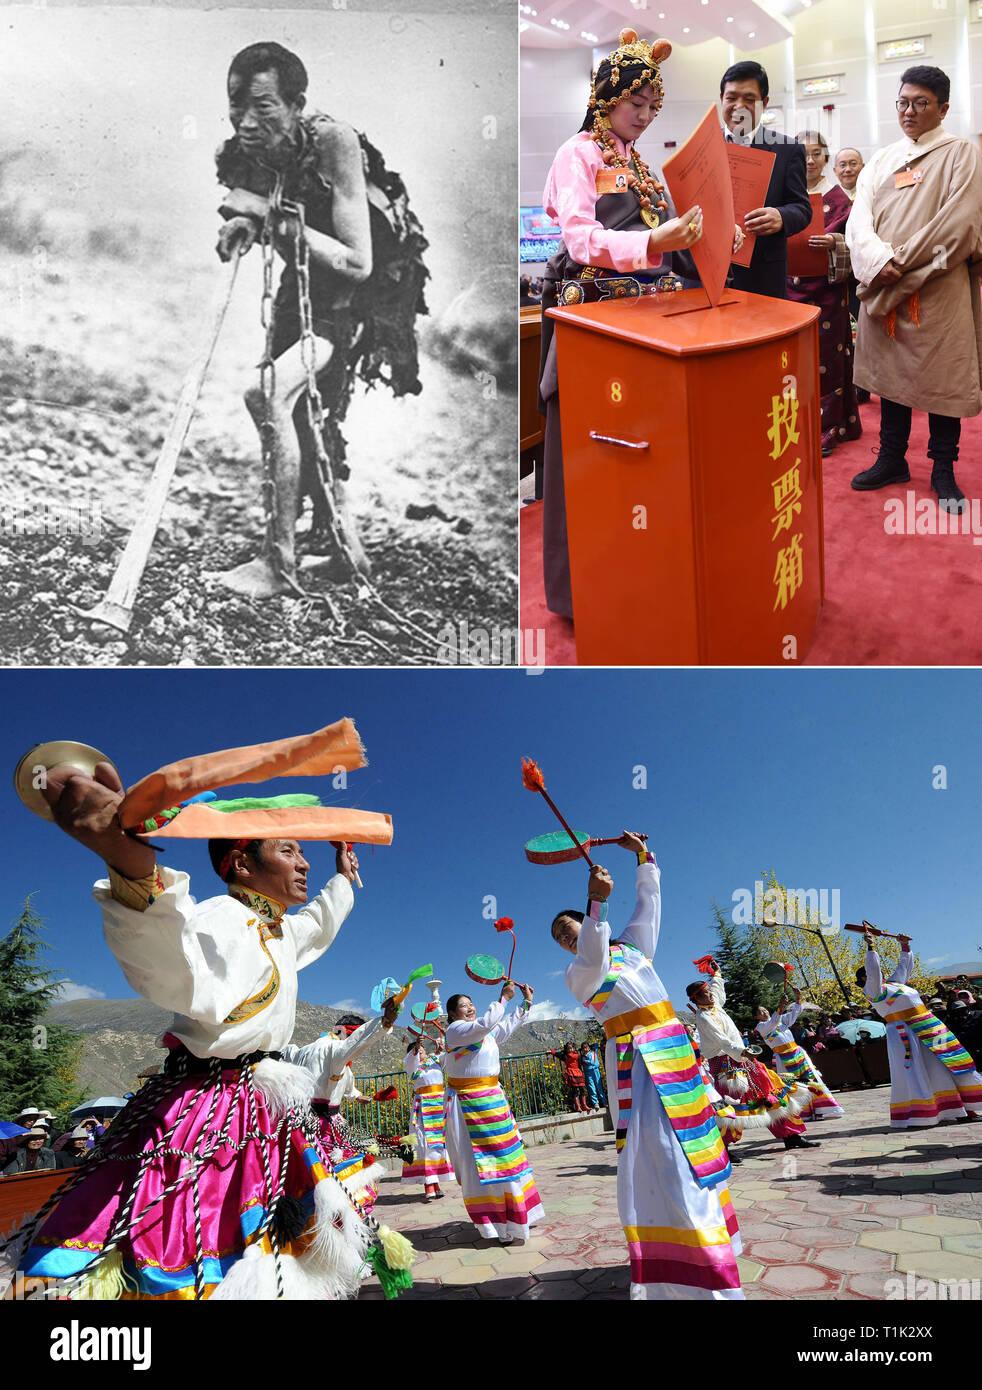 Old Tibet Stock Photos & Old Tibet Stock Images - Alamy